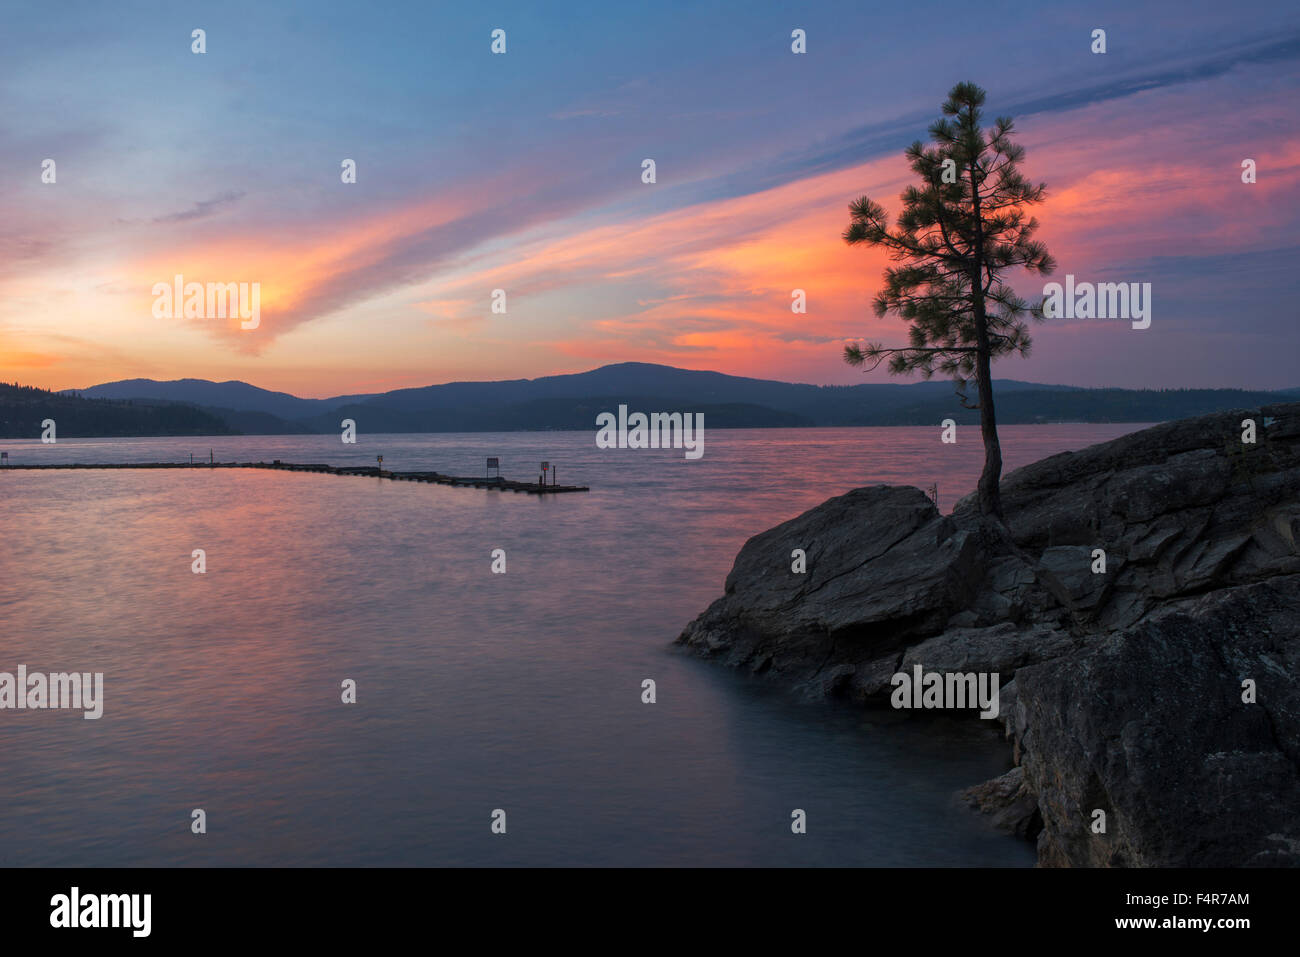 USA, United States, America, Idaho, Coeur d'Alene, shore, Rockies, rocky mountains, sunset, ship, lakefront, - Stock Image